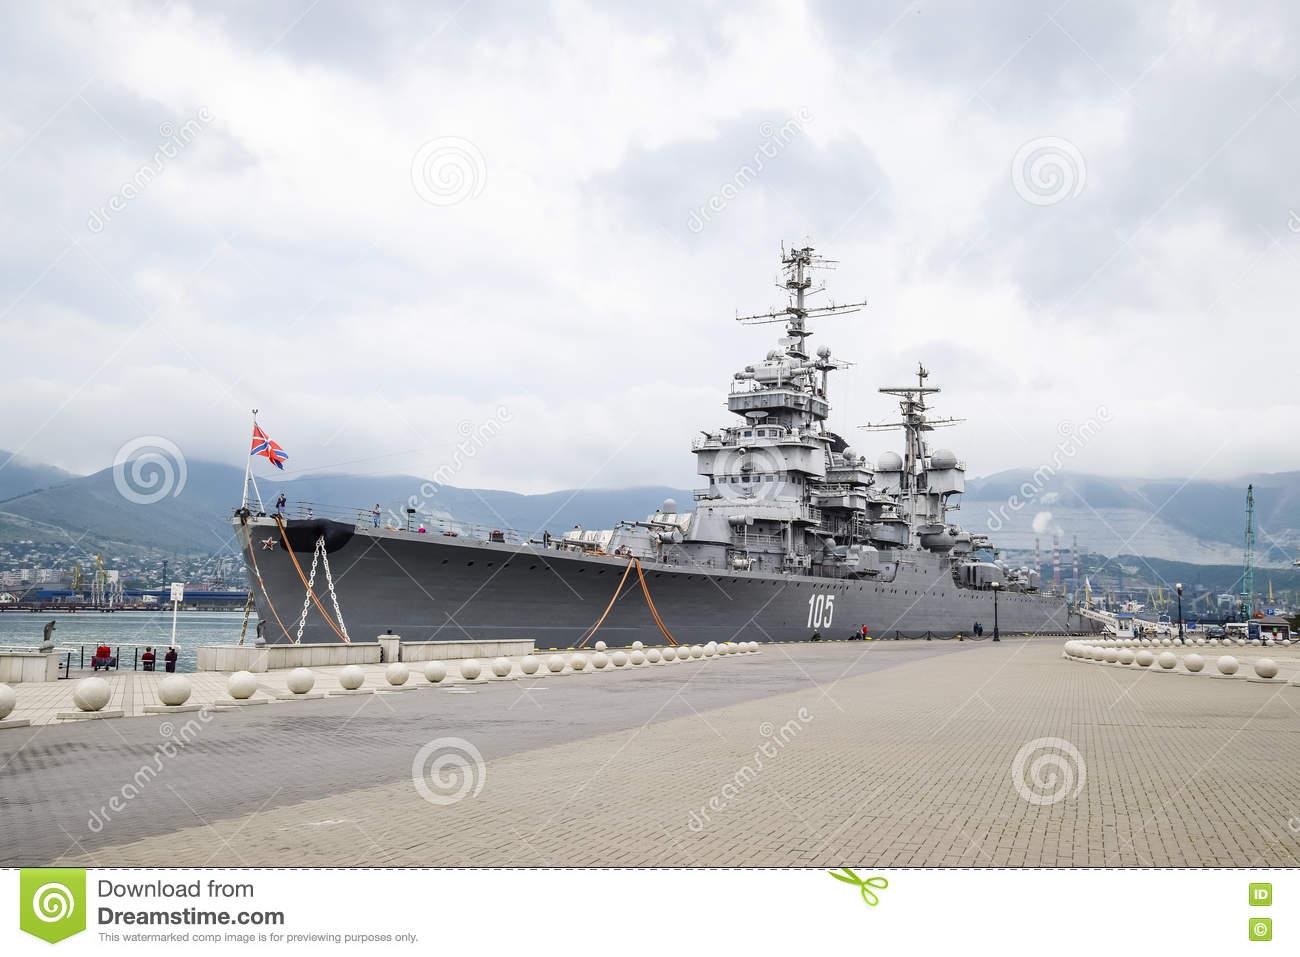 The Warship In The Port Of Novorossiysk Editorial Stock Photo.